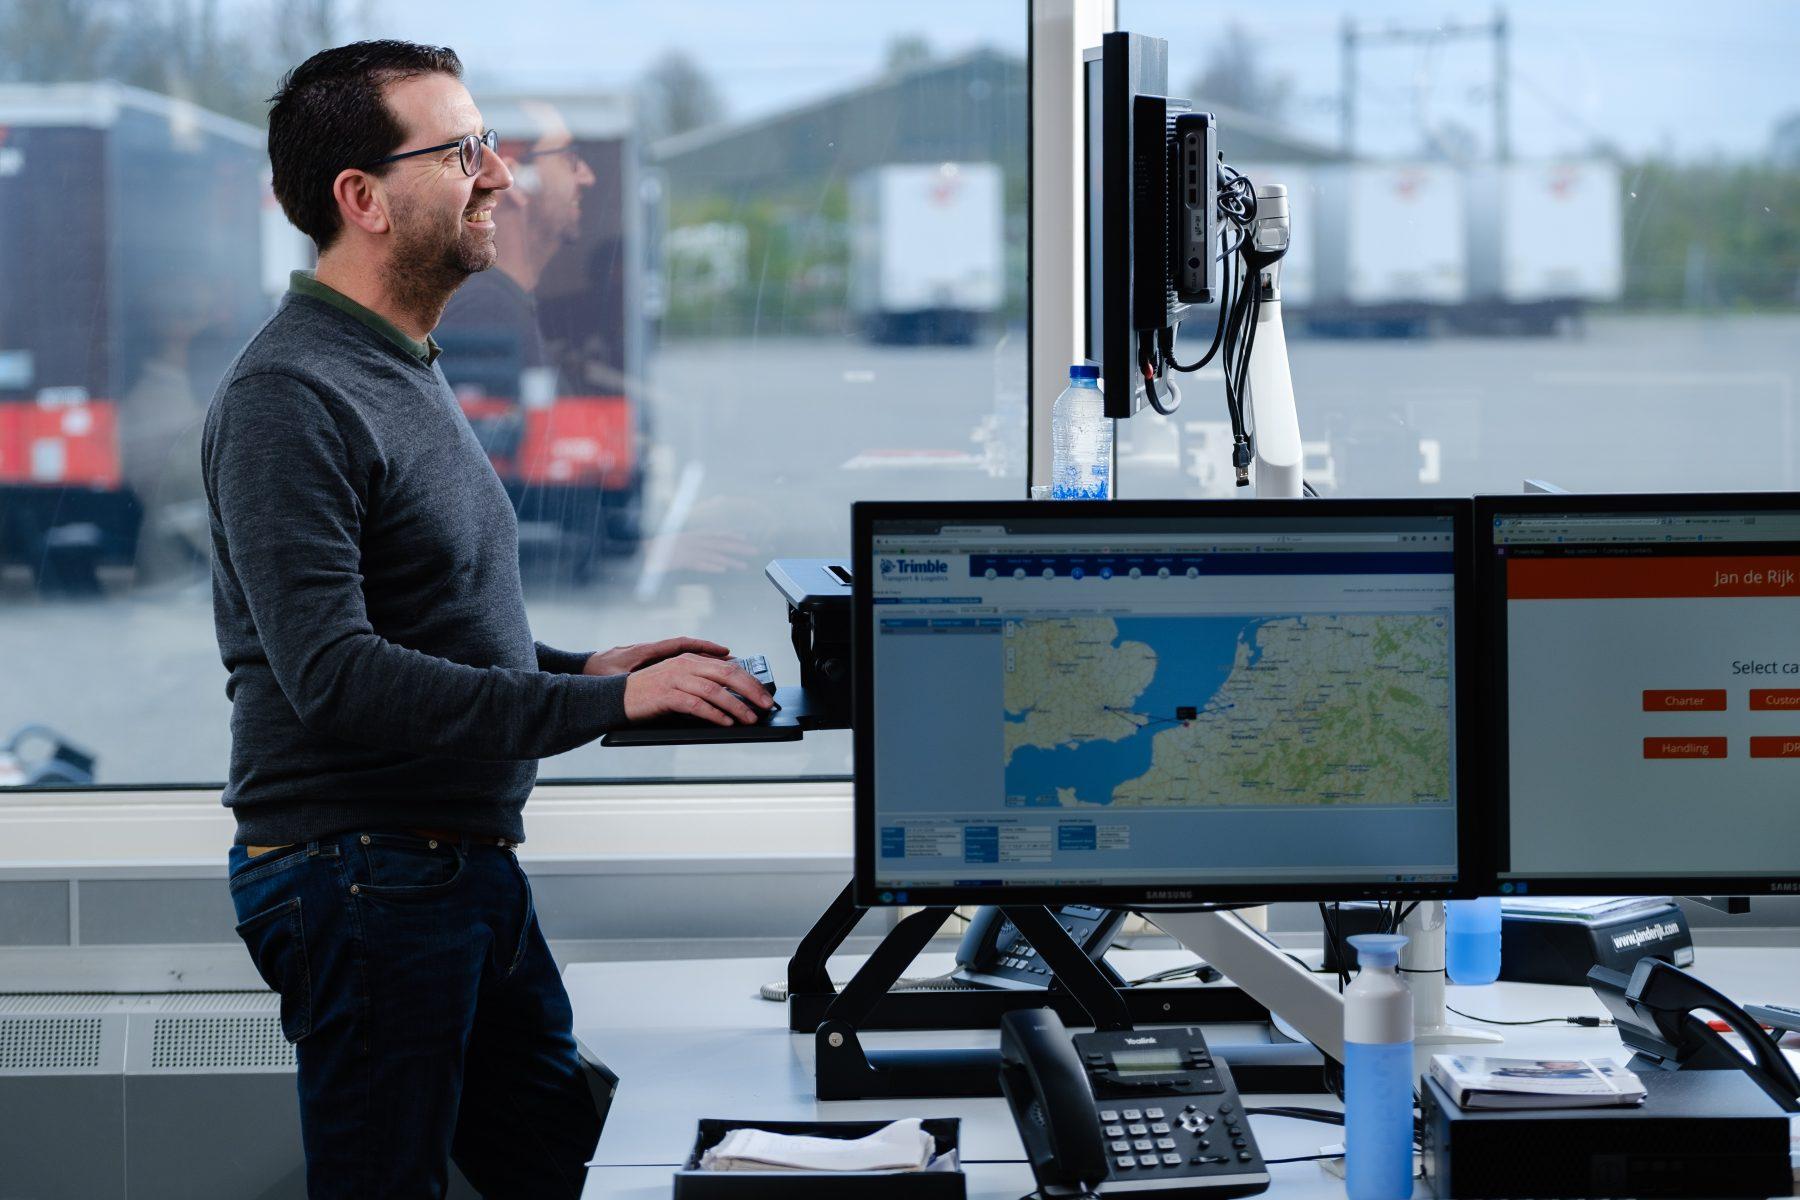 IT systemen bij Jan de Rijk Logistics